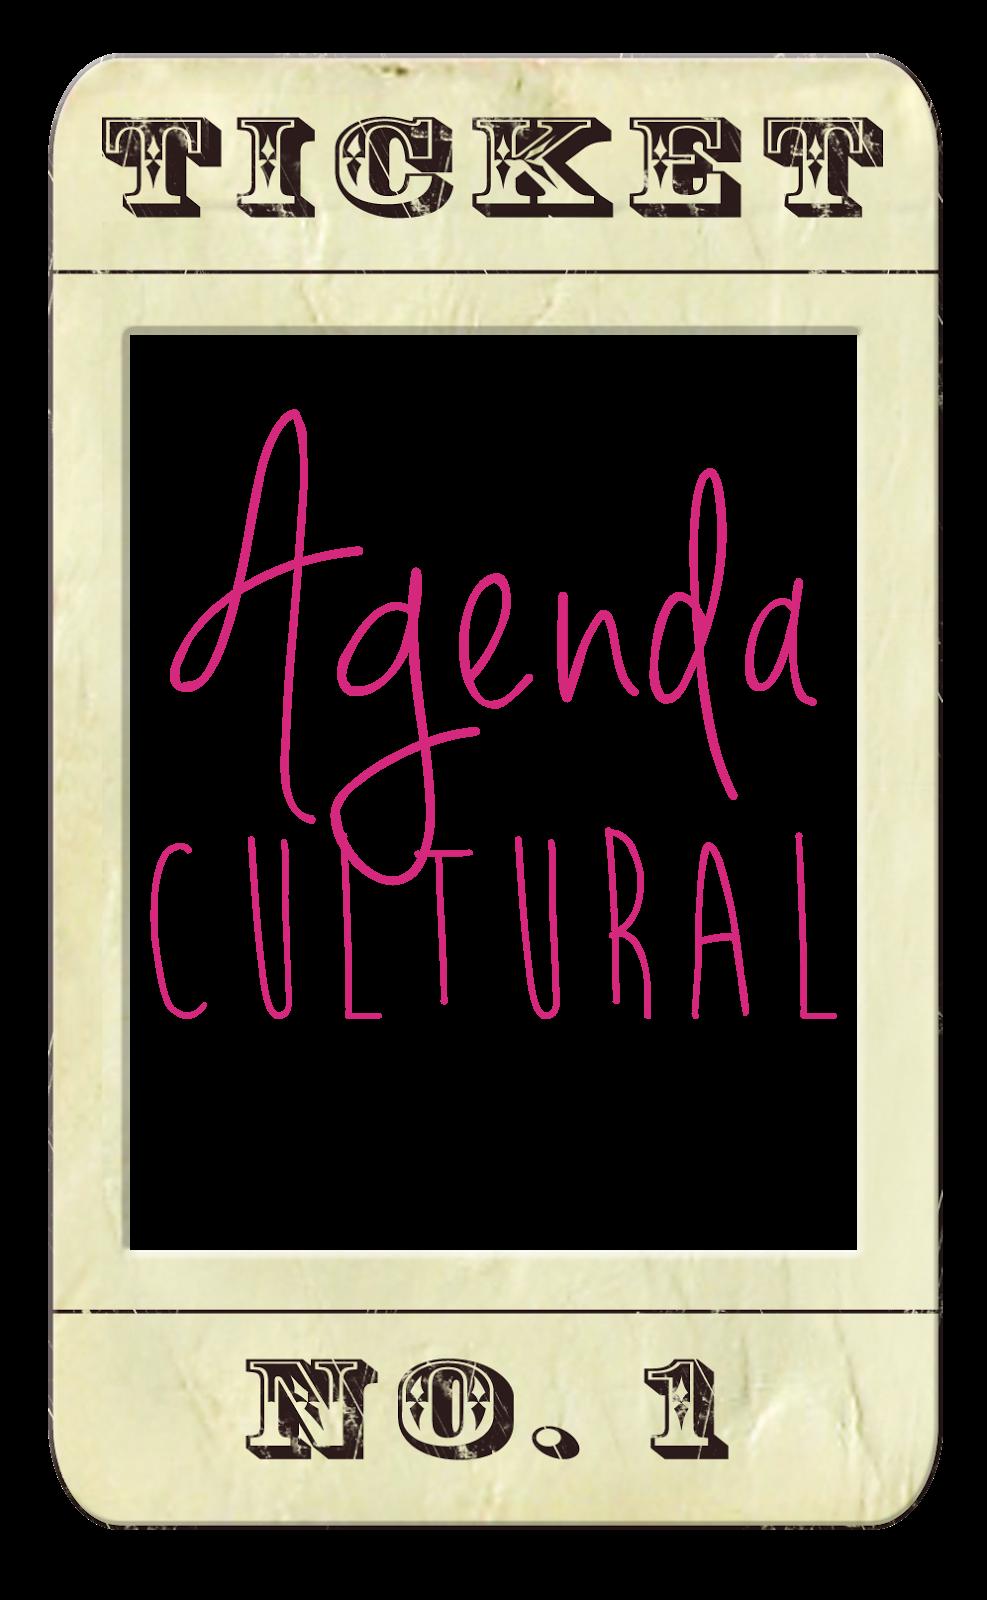 selo agenda cultural para curitiba blog Mamãe de Salto